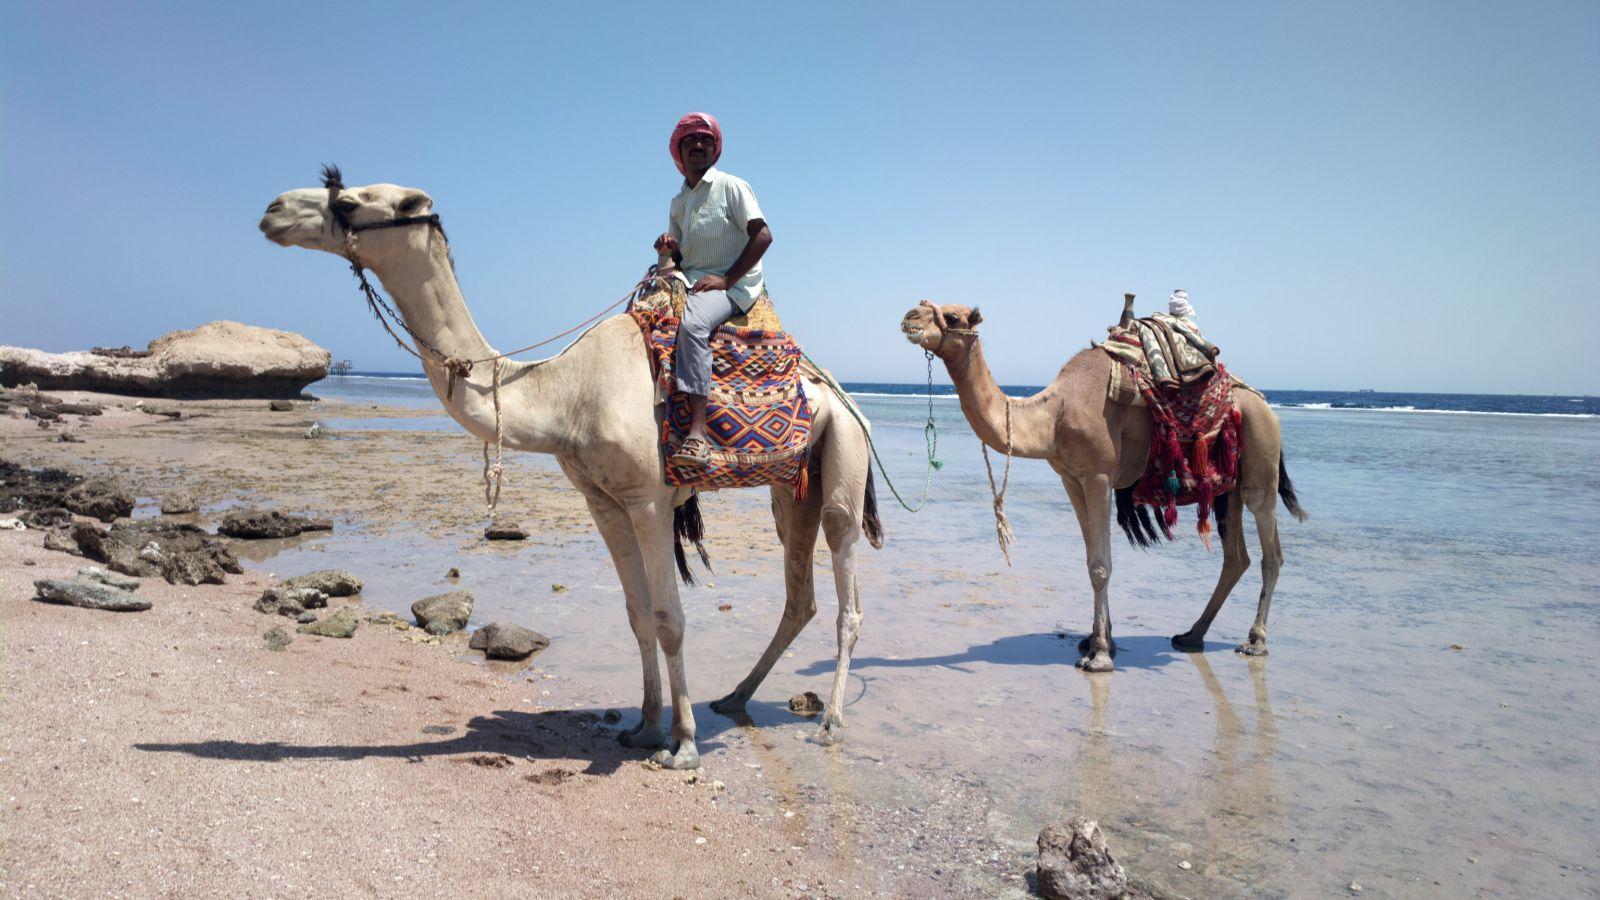 Nokia 808 - La spiaggia di Sharm El Sheikh